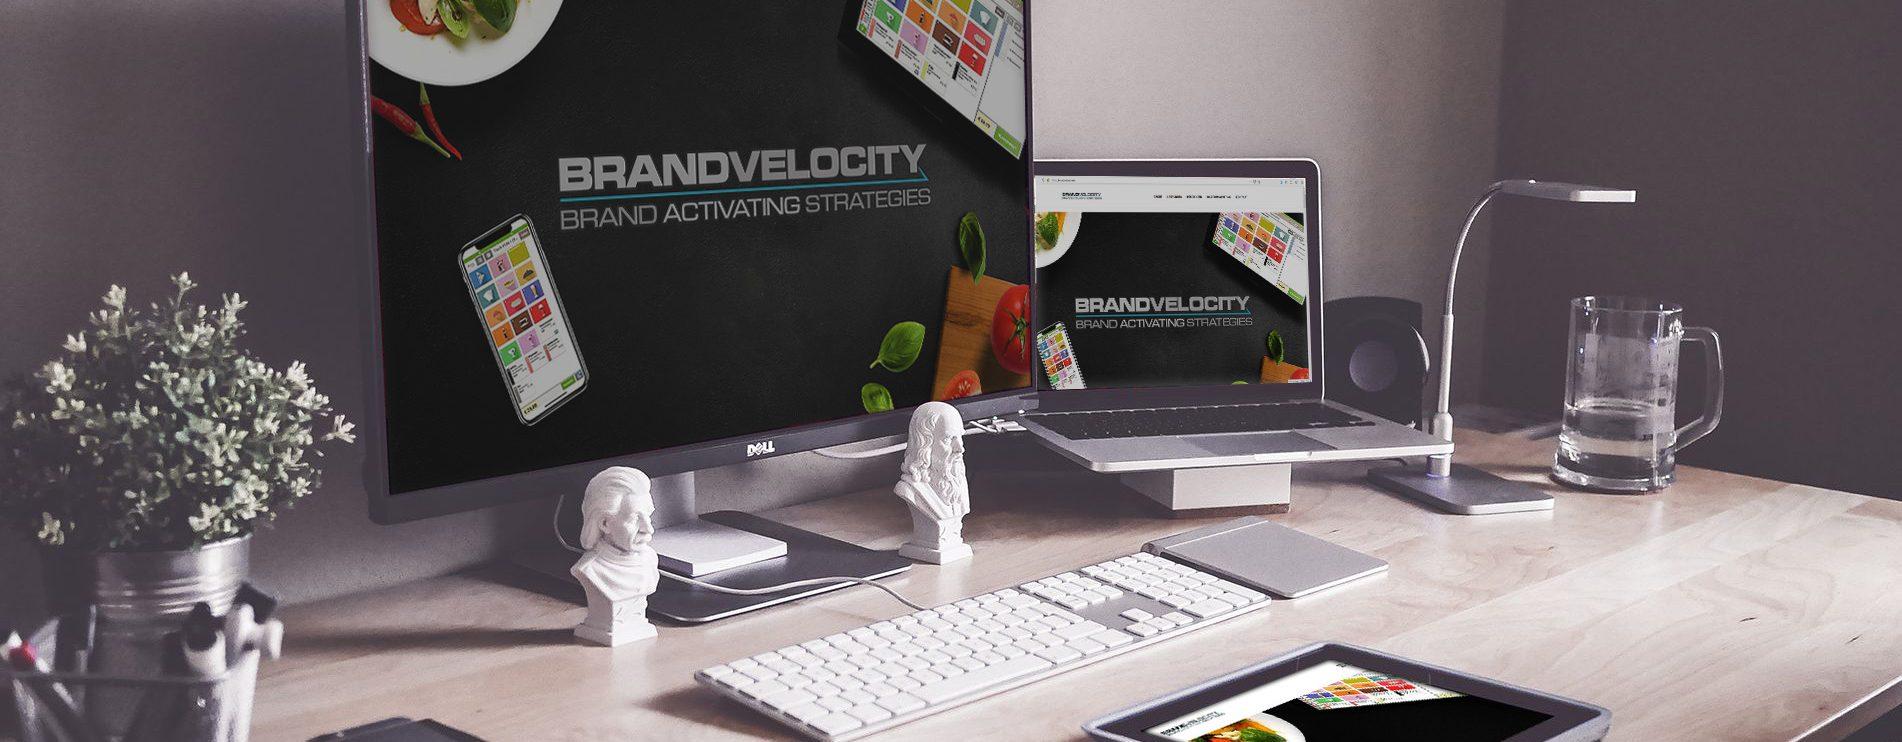 brandvelocity webdesign